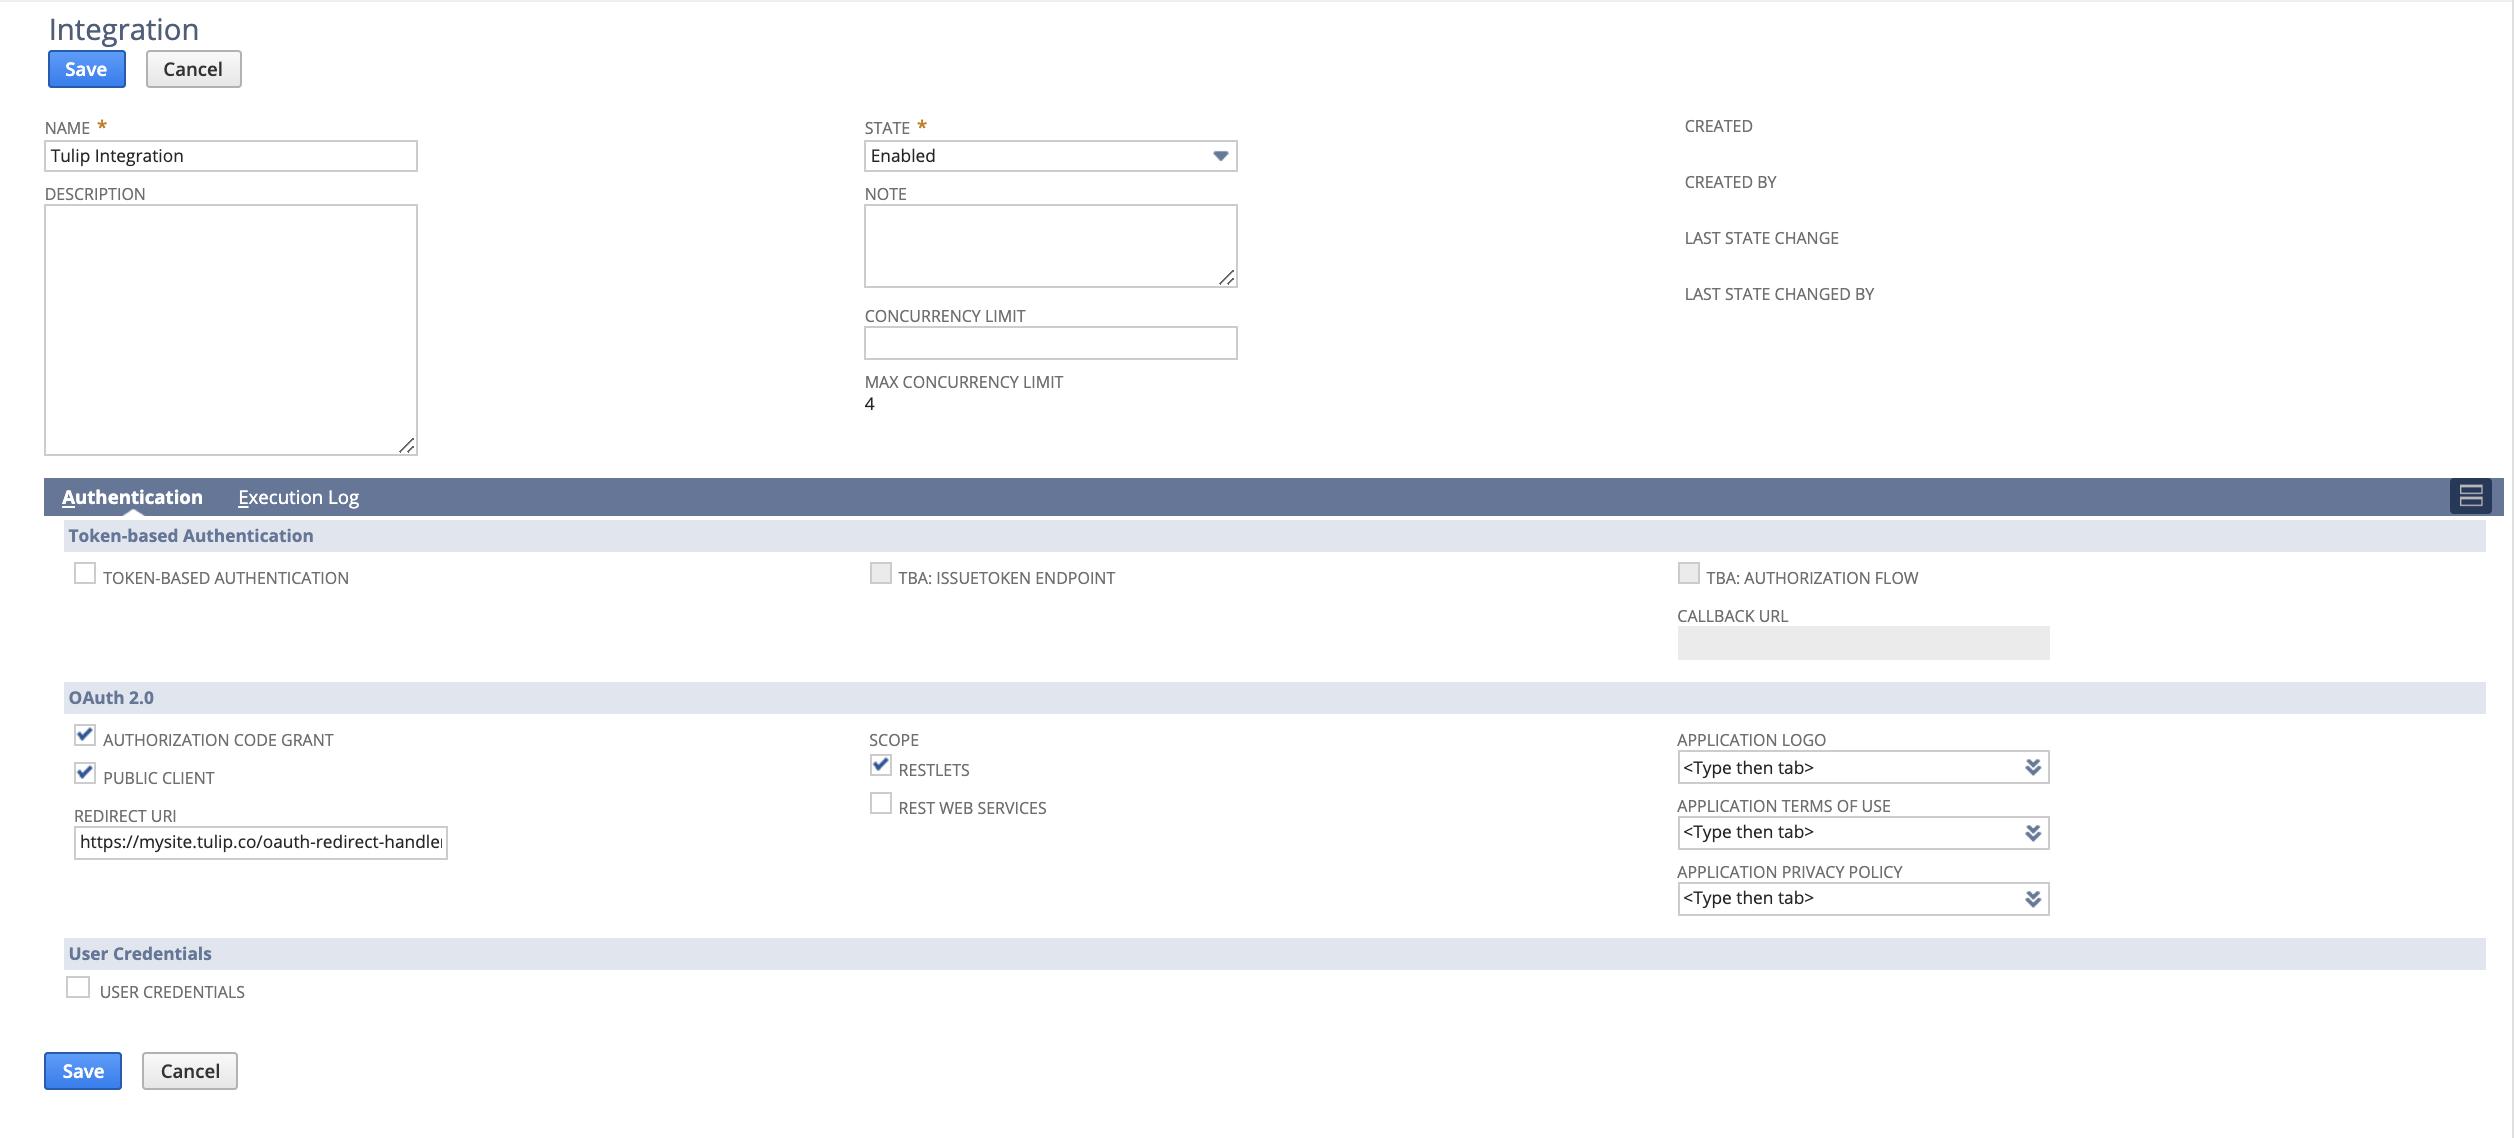 tulip-netsuite-oauth2.0-integration